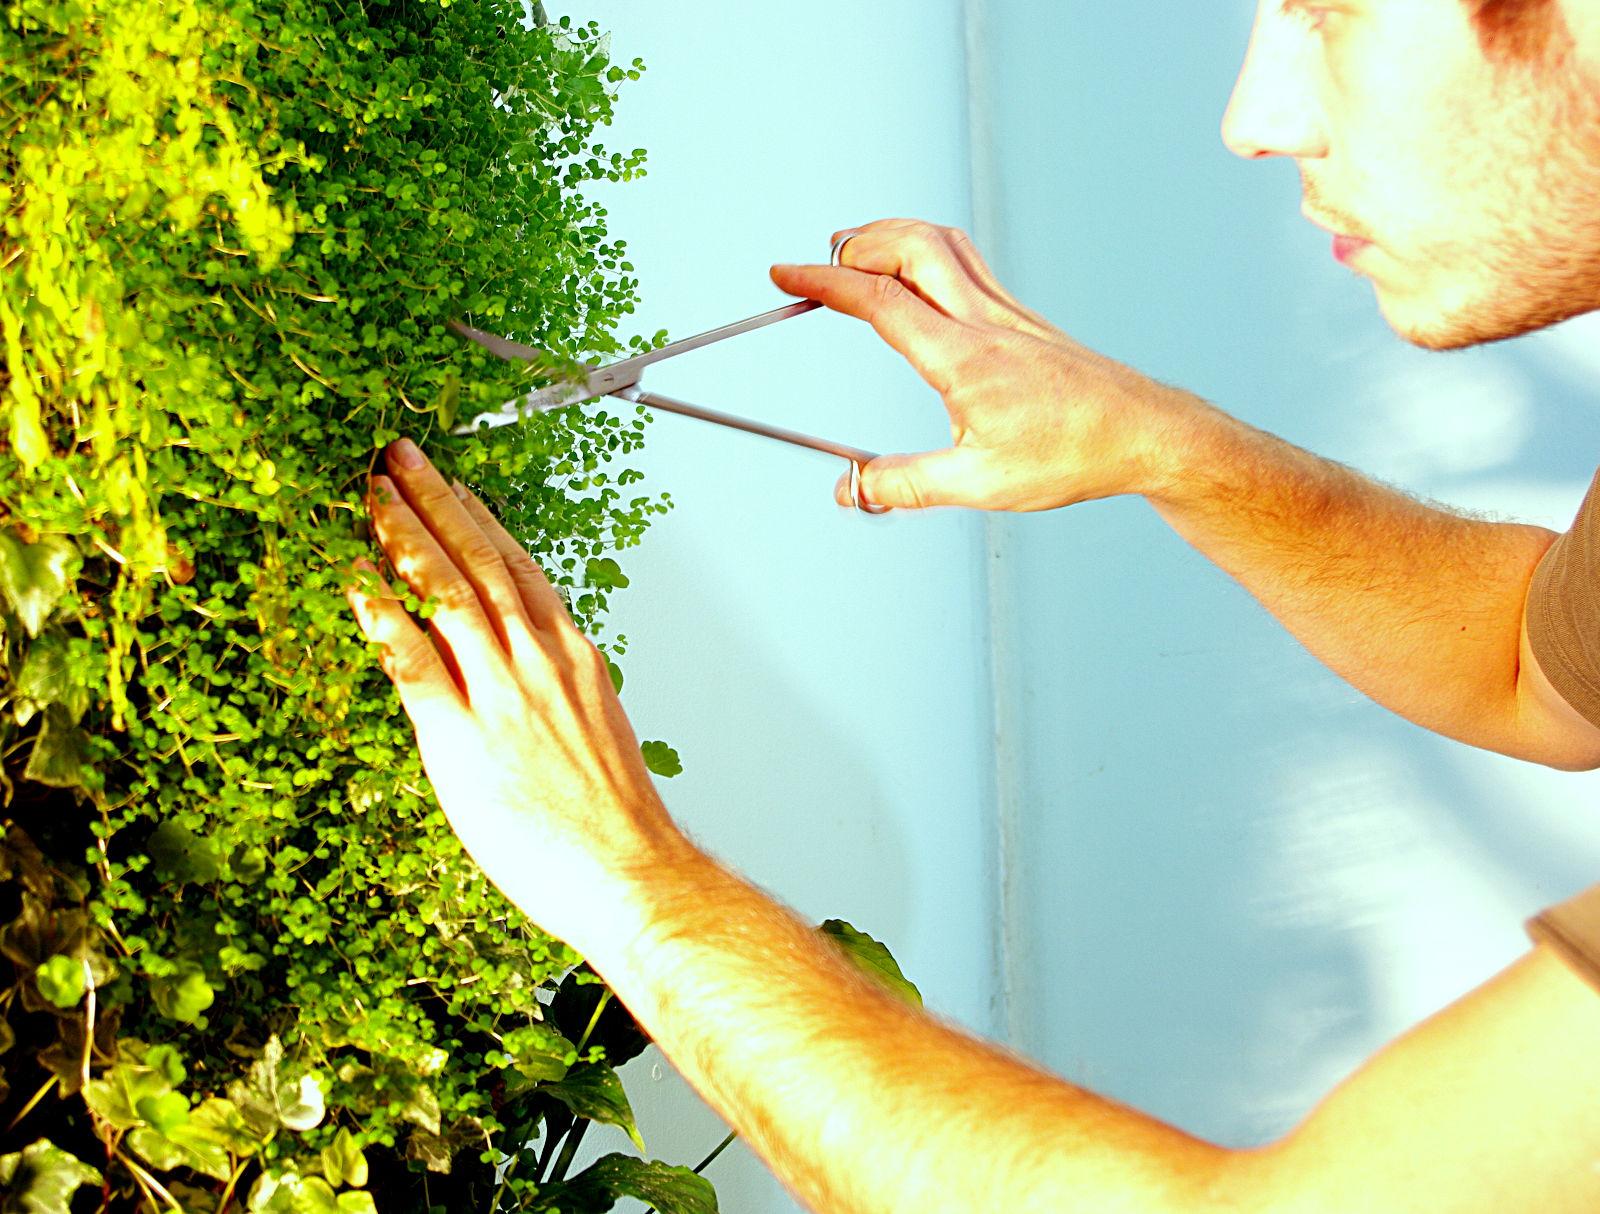 entretien d 39 un jardin vertical mur v g tal et aquarium. Black Bedroom Furniture Sets. Home Design Ideas